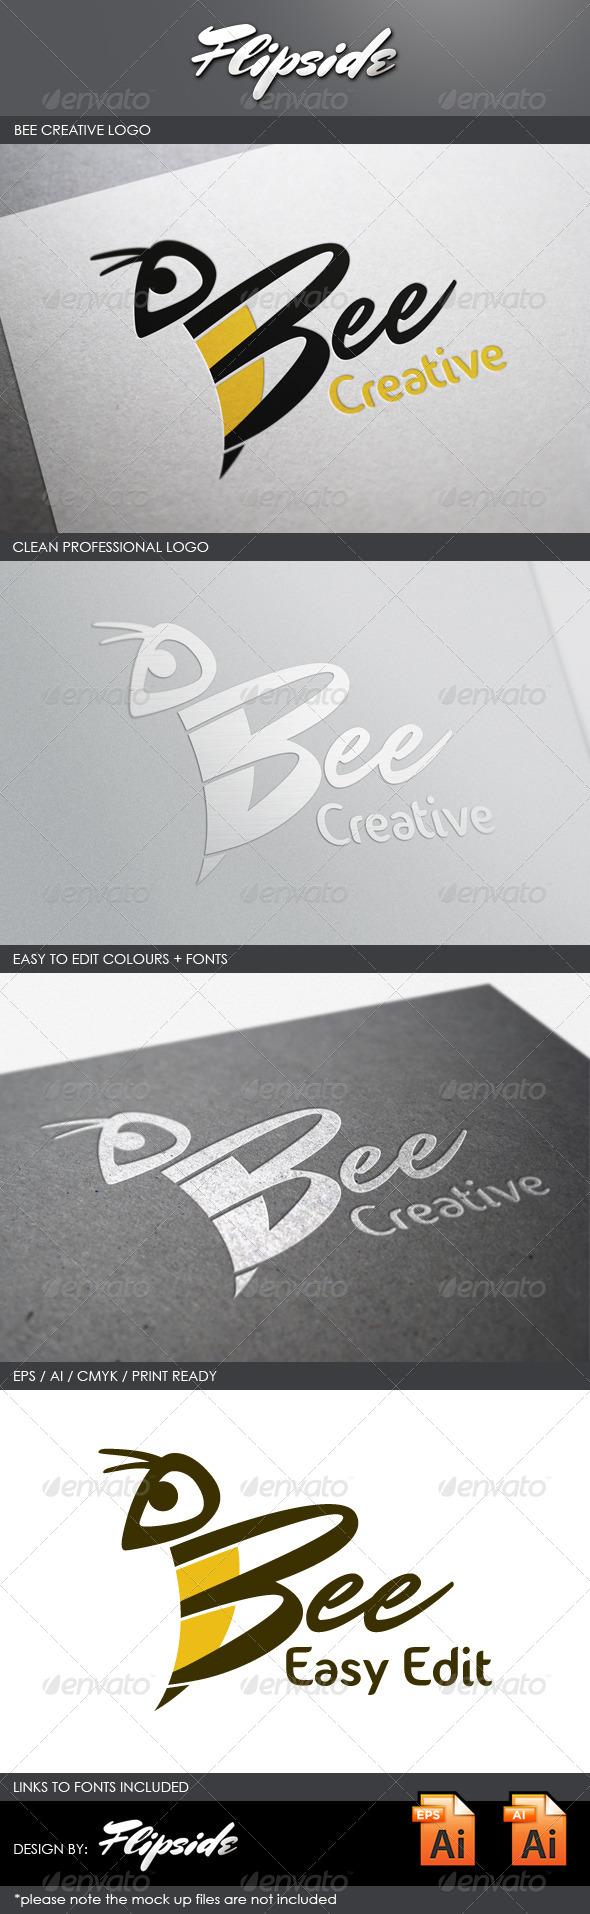 GraphicRiver Bee Creative Logo 4327407